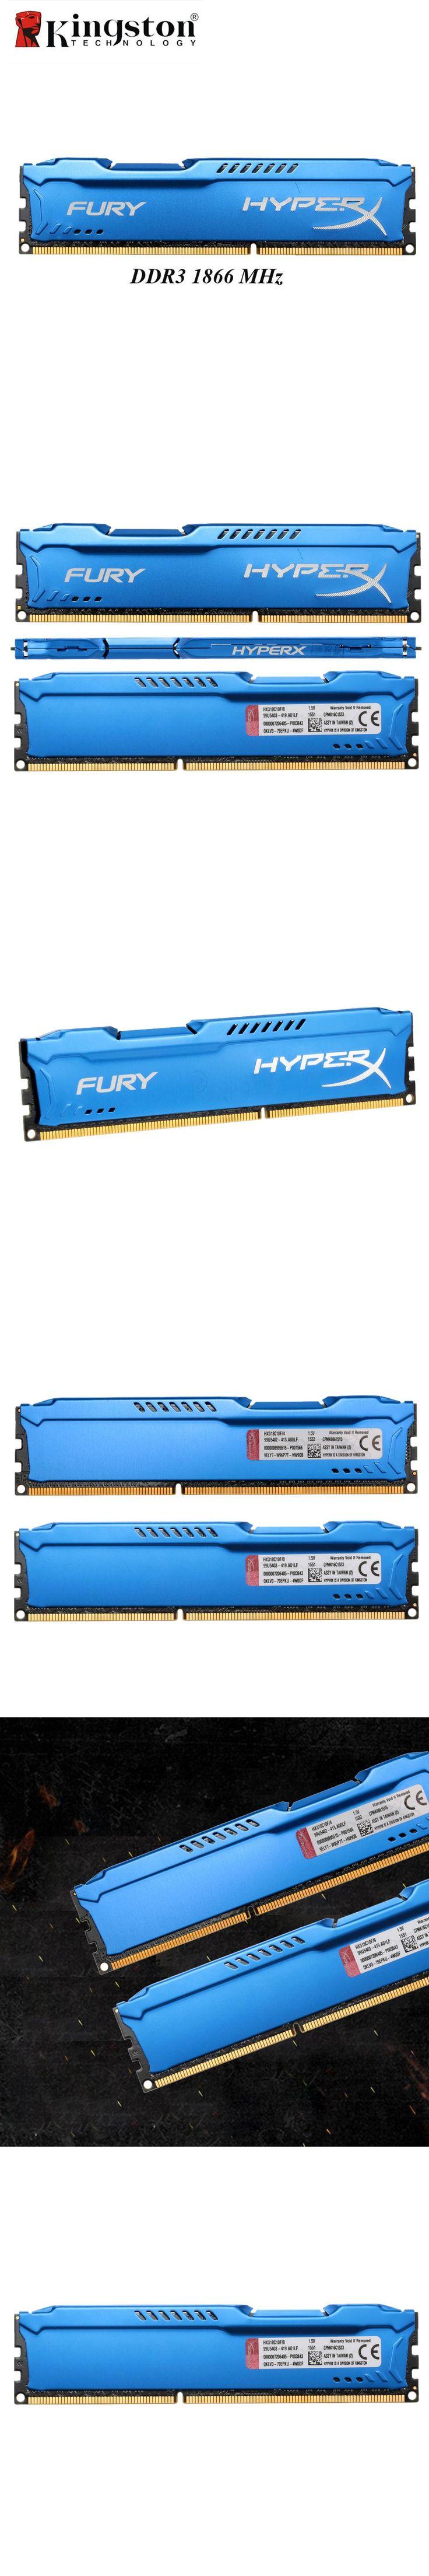 Kingston HyperX Fury DDR3 4GB 8GB Memoria RAM 1866MHz DDR 3 DIMM Intel Gaming Memory For Desktop PC 204pin DDR3 SDRAM 4 GB 8 GB